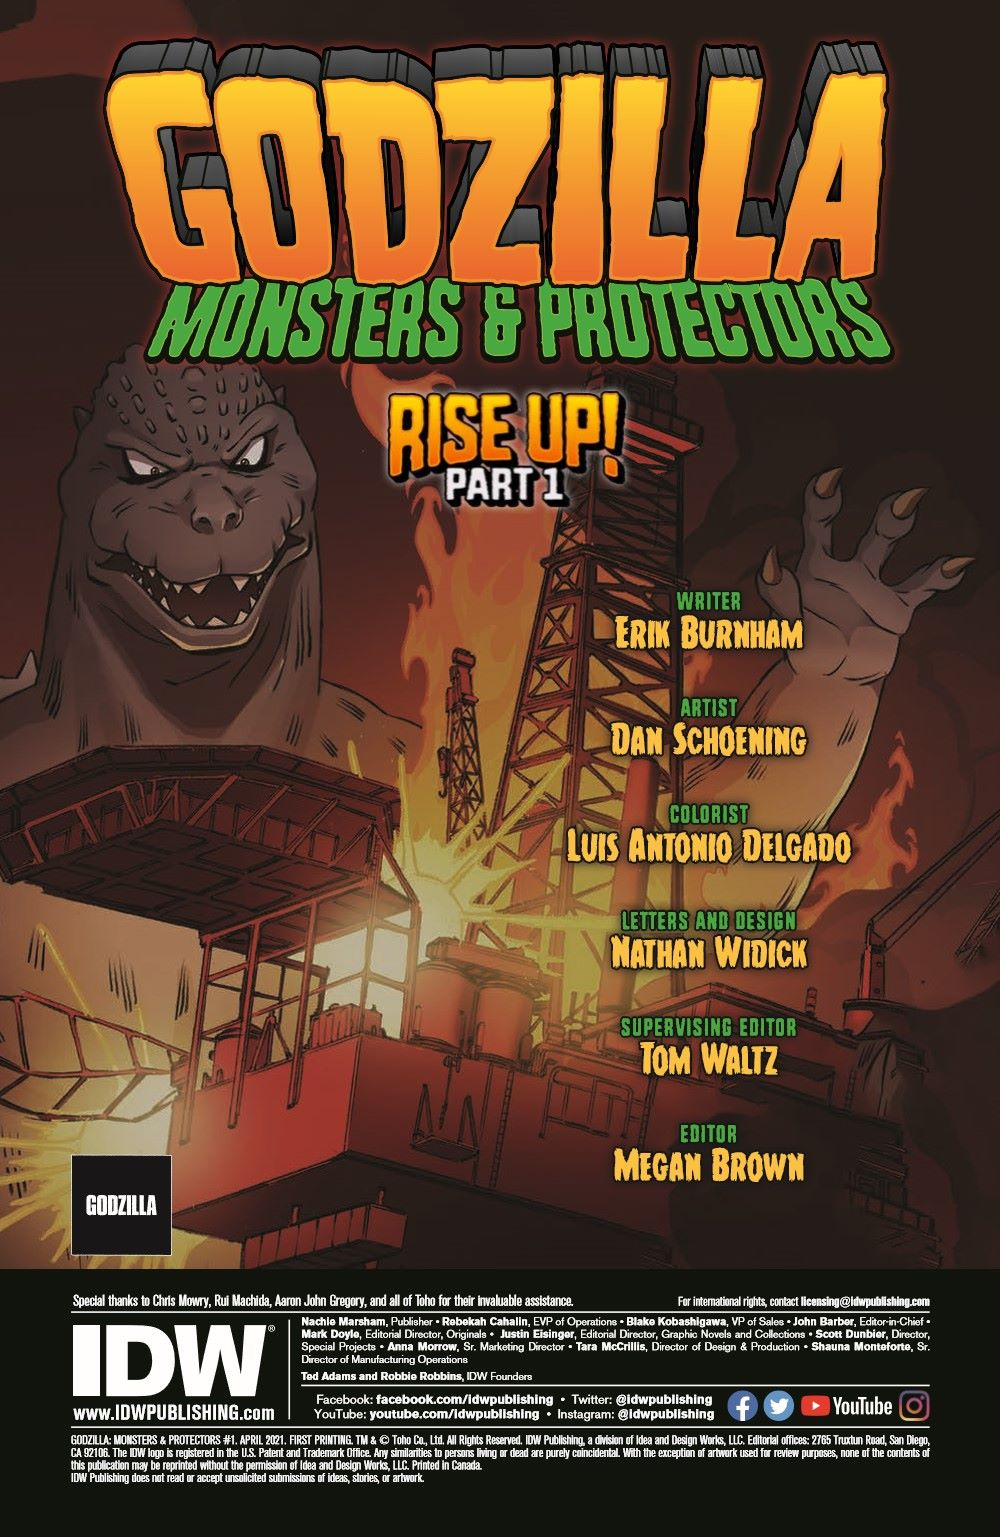 Godzilla_MnP_01_pr-2 ComicList Previews: GODZILLA MONSTERS AND PROTECTORS #1 (OF 5)